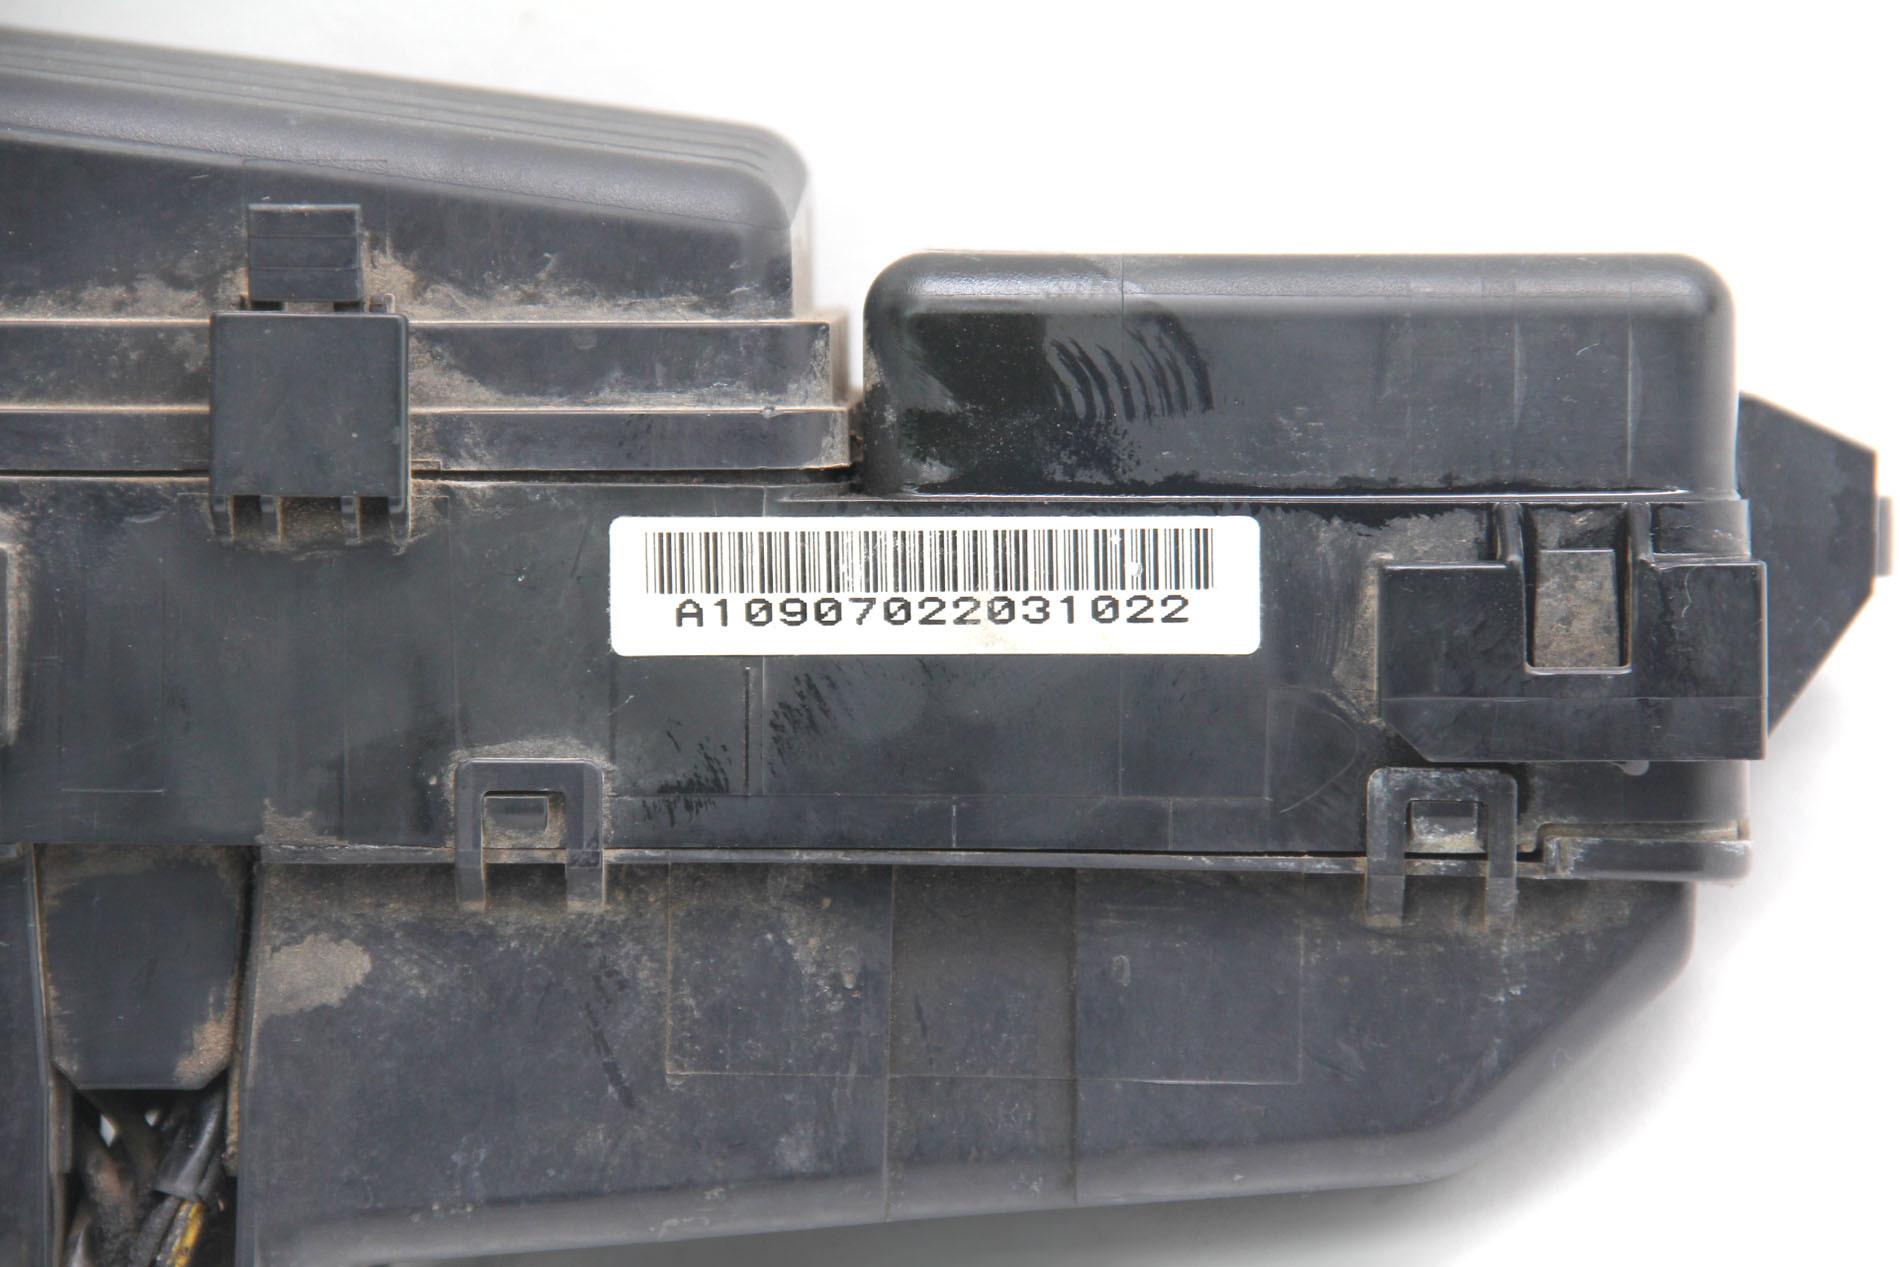 ... Honda Ridgeline Exterior Under Hood Fuse Box 38250-SJC-A12 OEM 06 ...